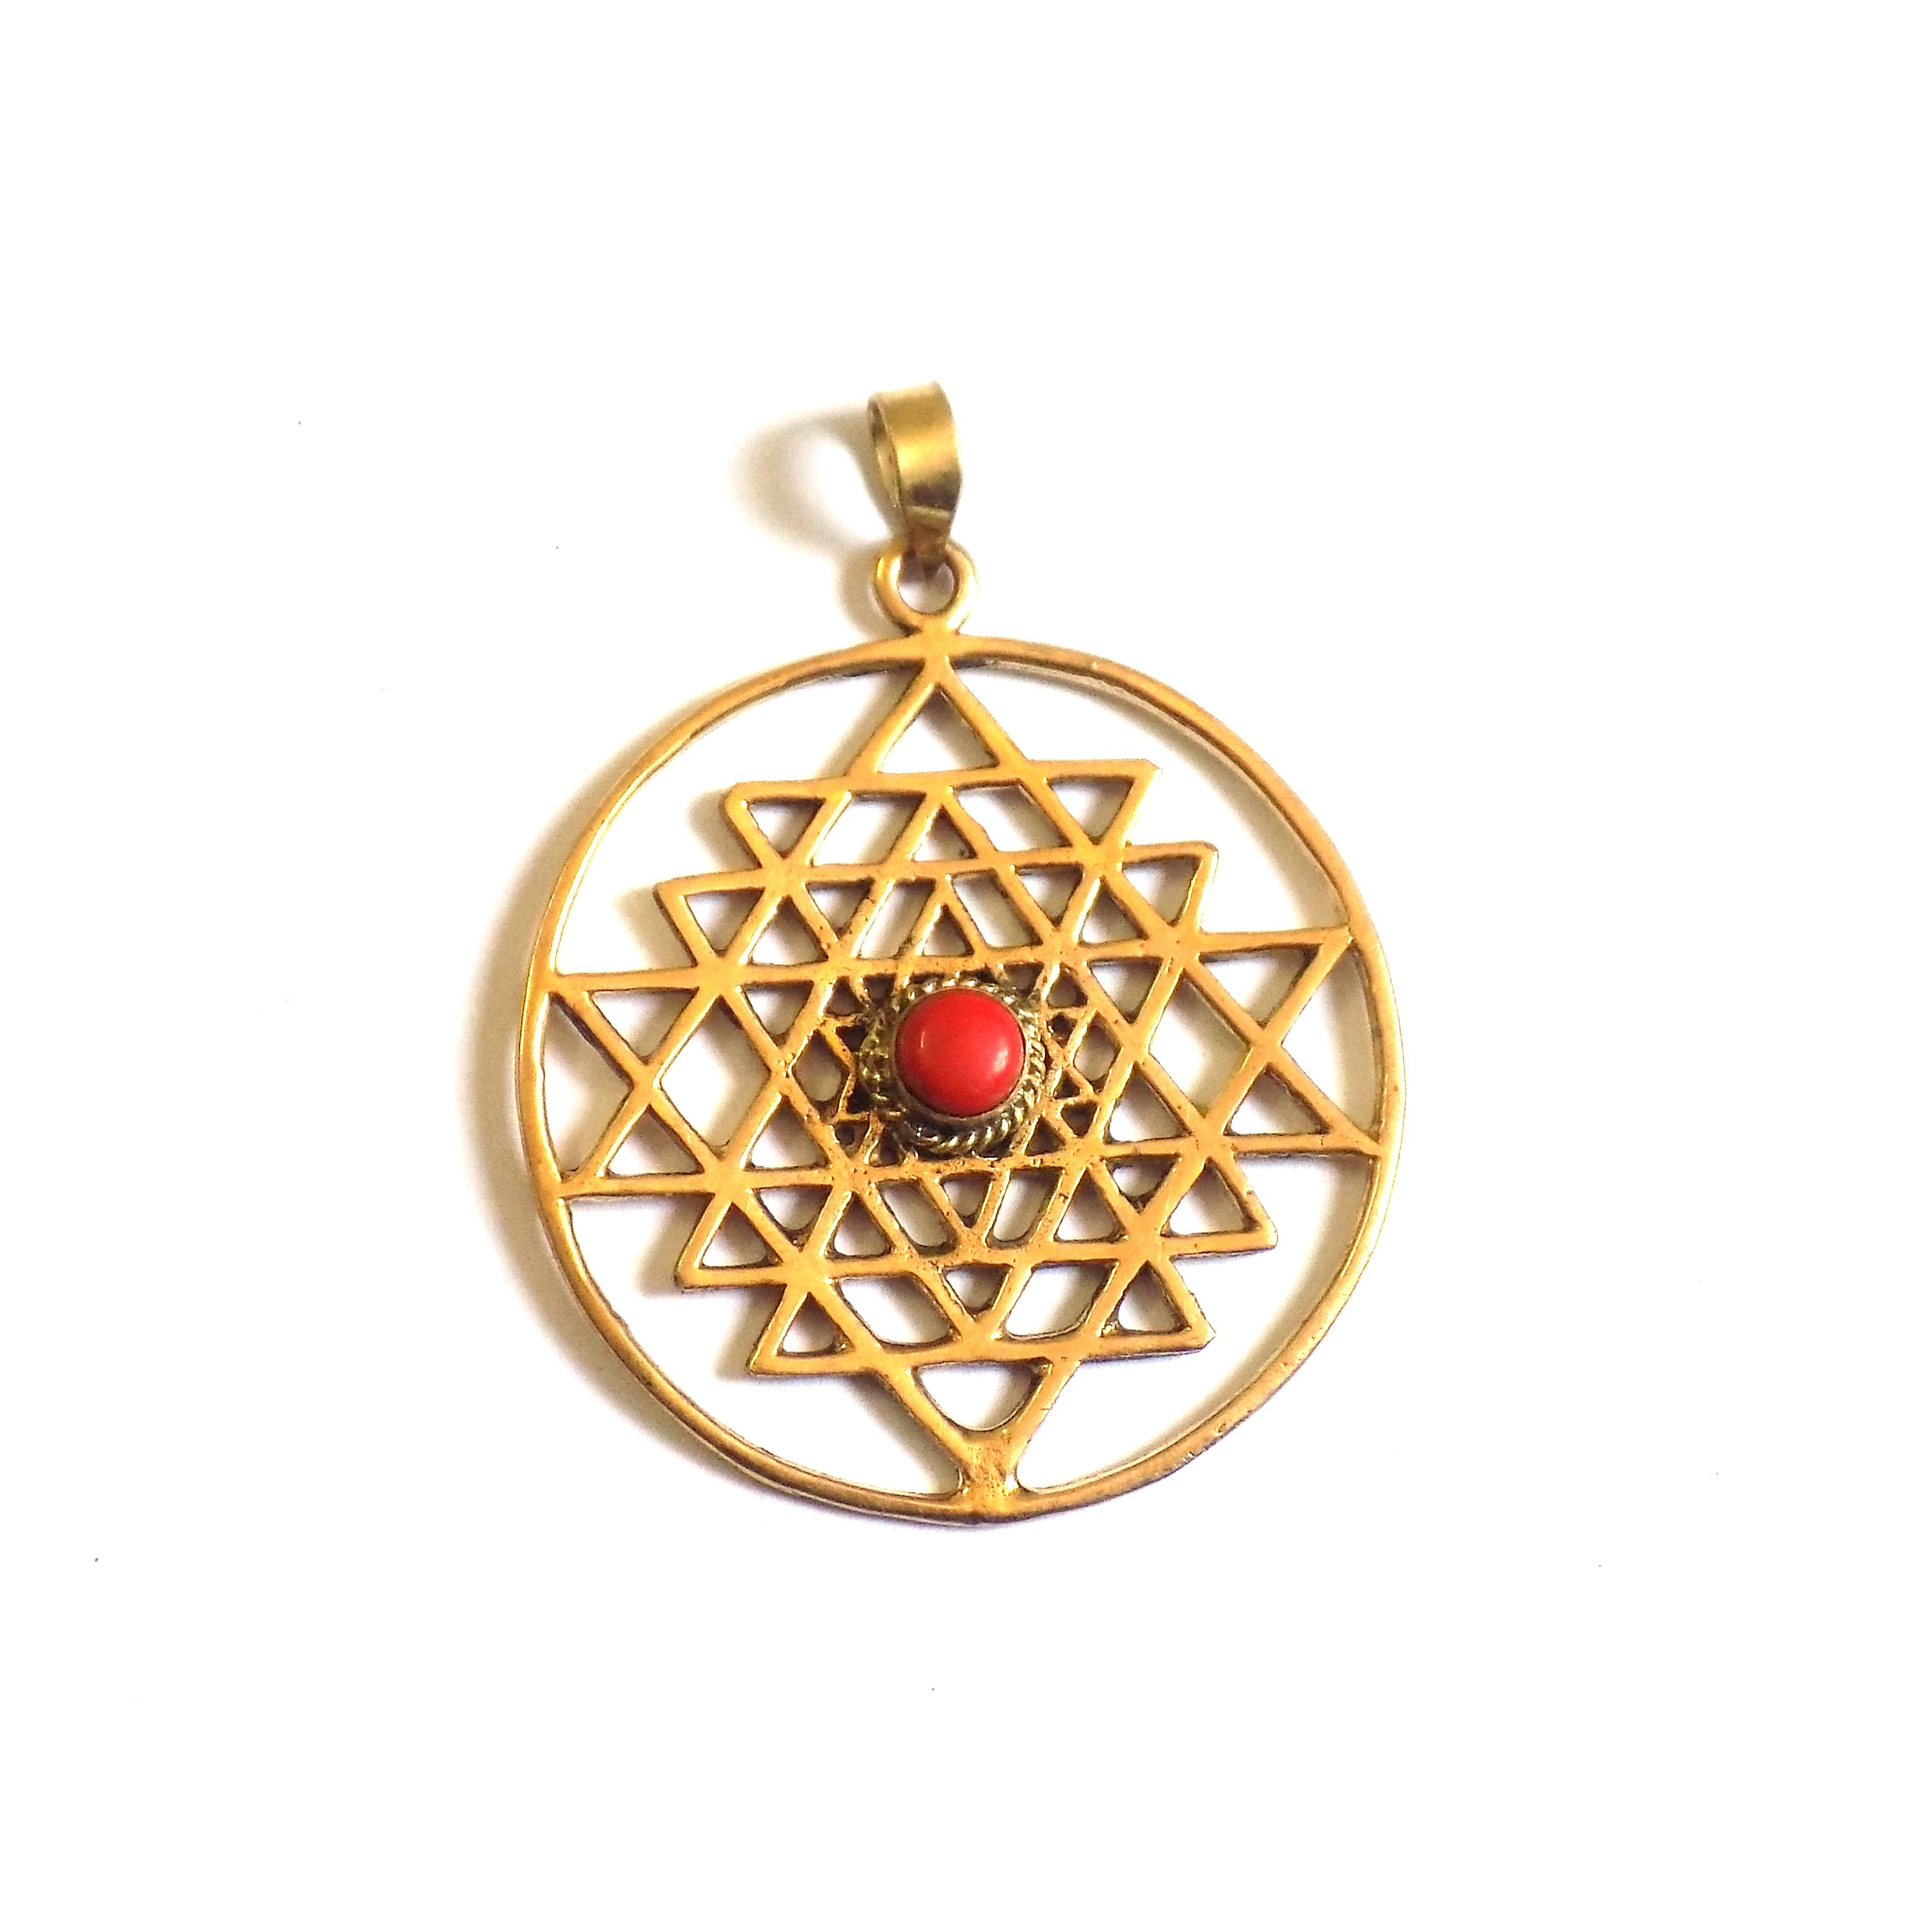 pc brass pendant round shape for women girls brass jewelry